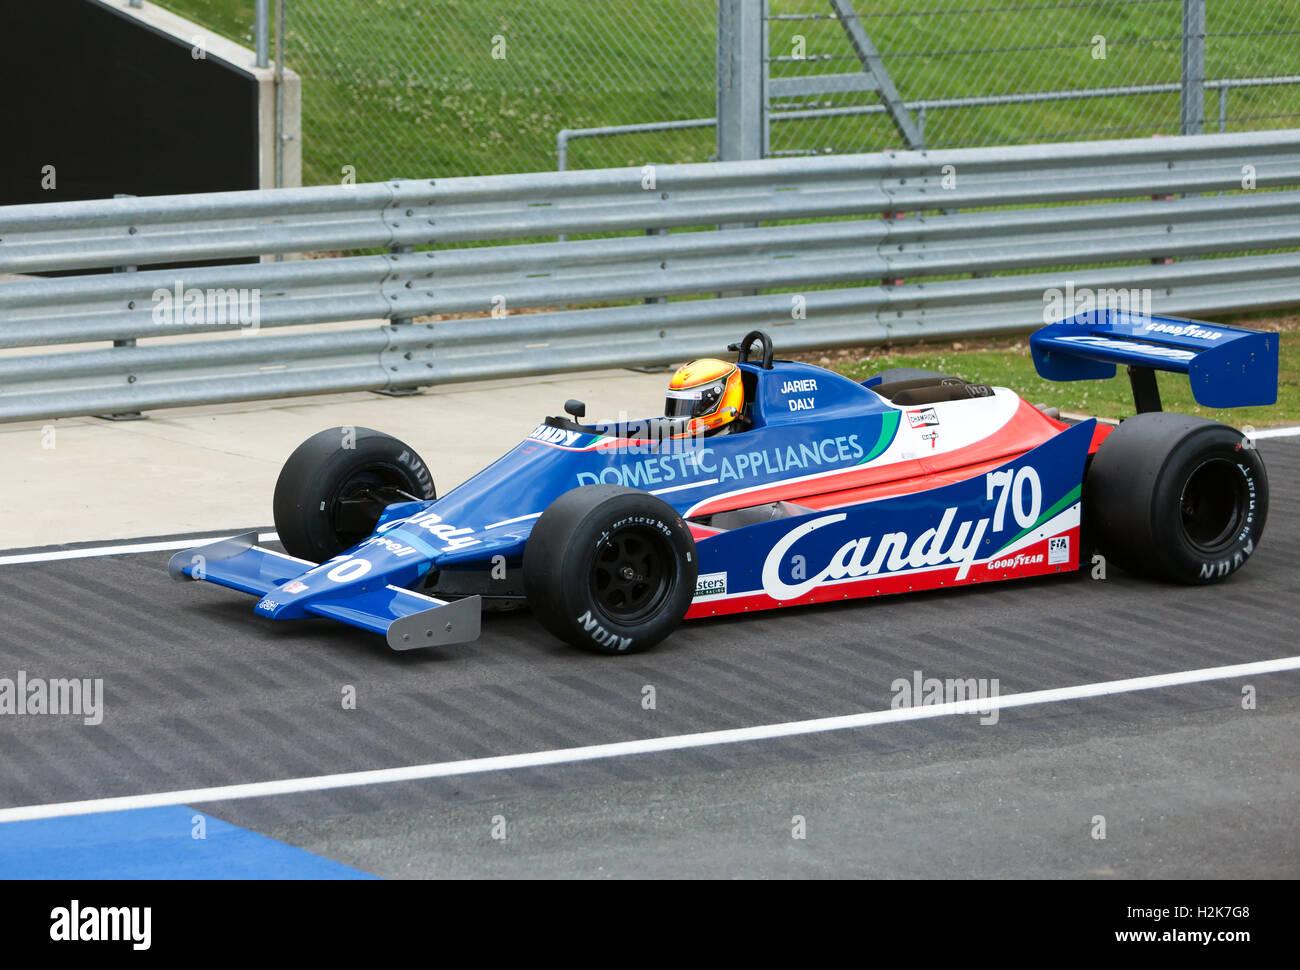 loic-deman-guida-un-1980-tyrrell-010-in-